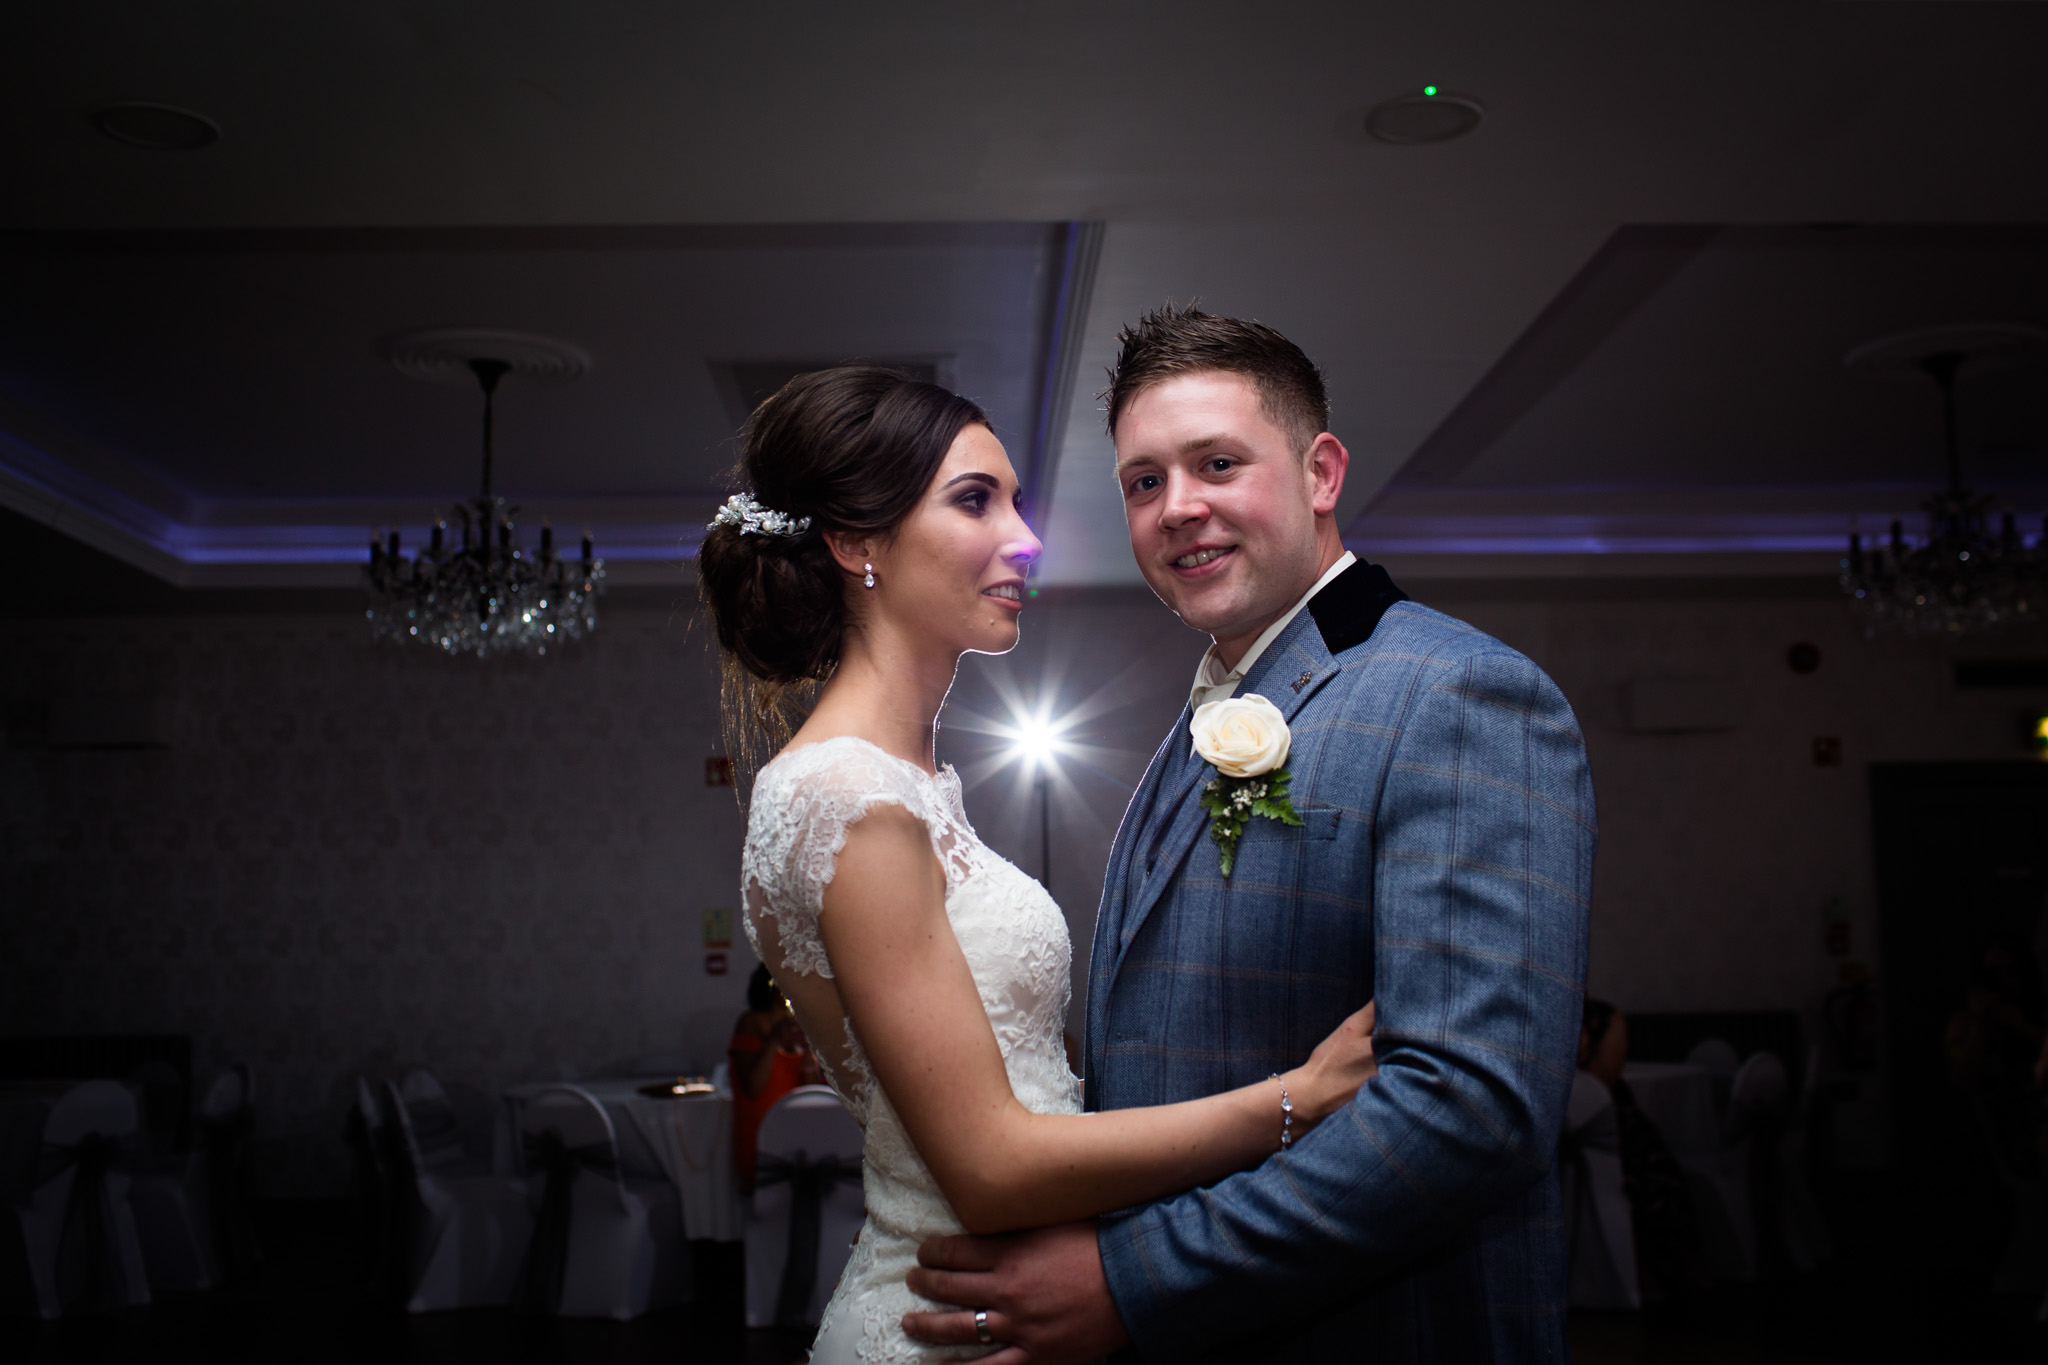 Mark_Barnes_Northern_Ireland_Wedding_Photography_Leighinmohr-house-hotel-ballymena_Wedding_Photography-65.jpg